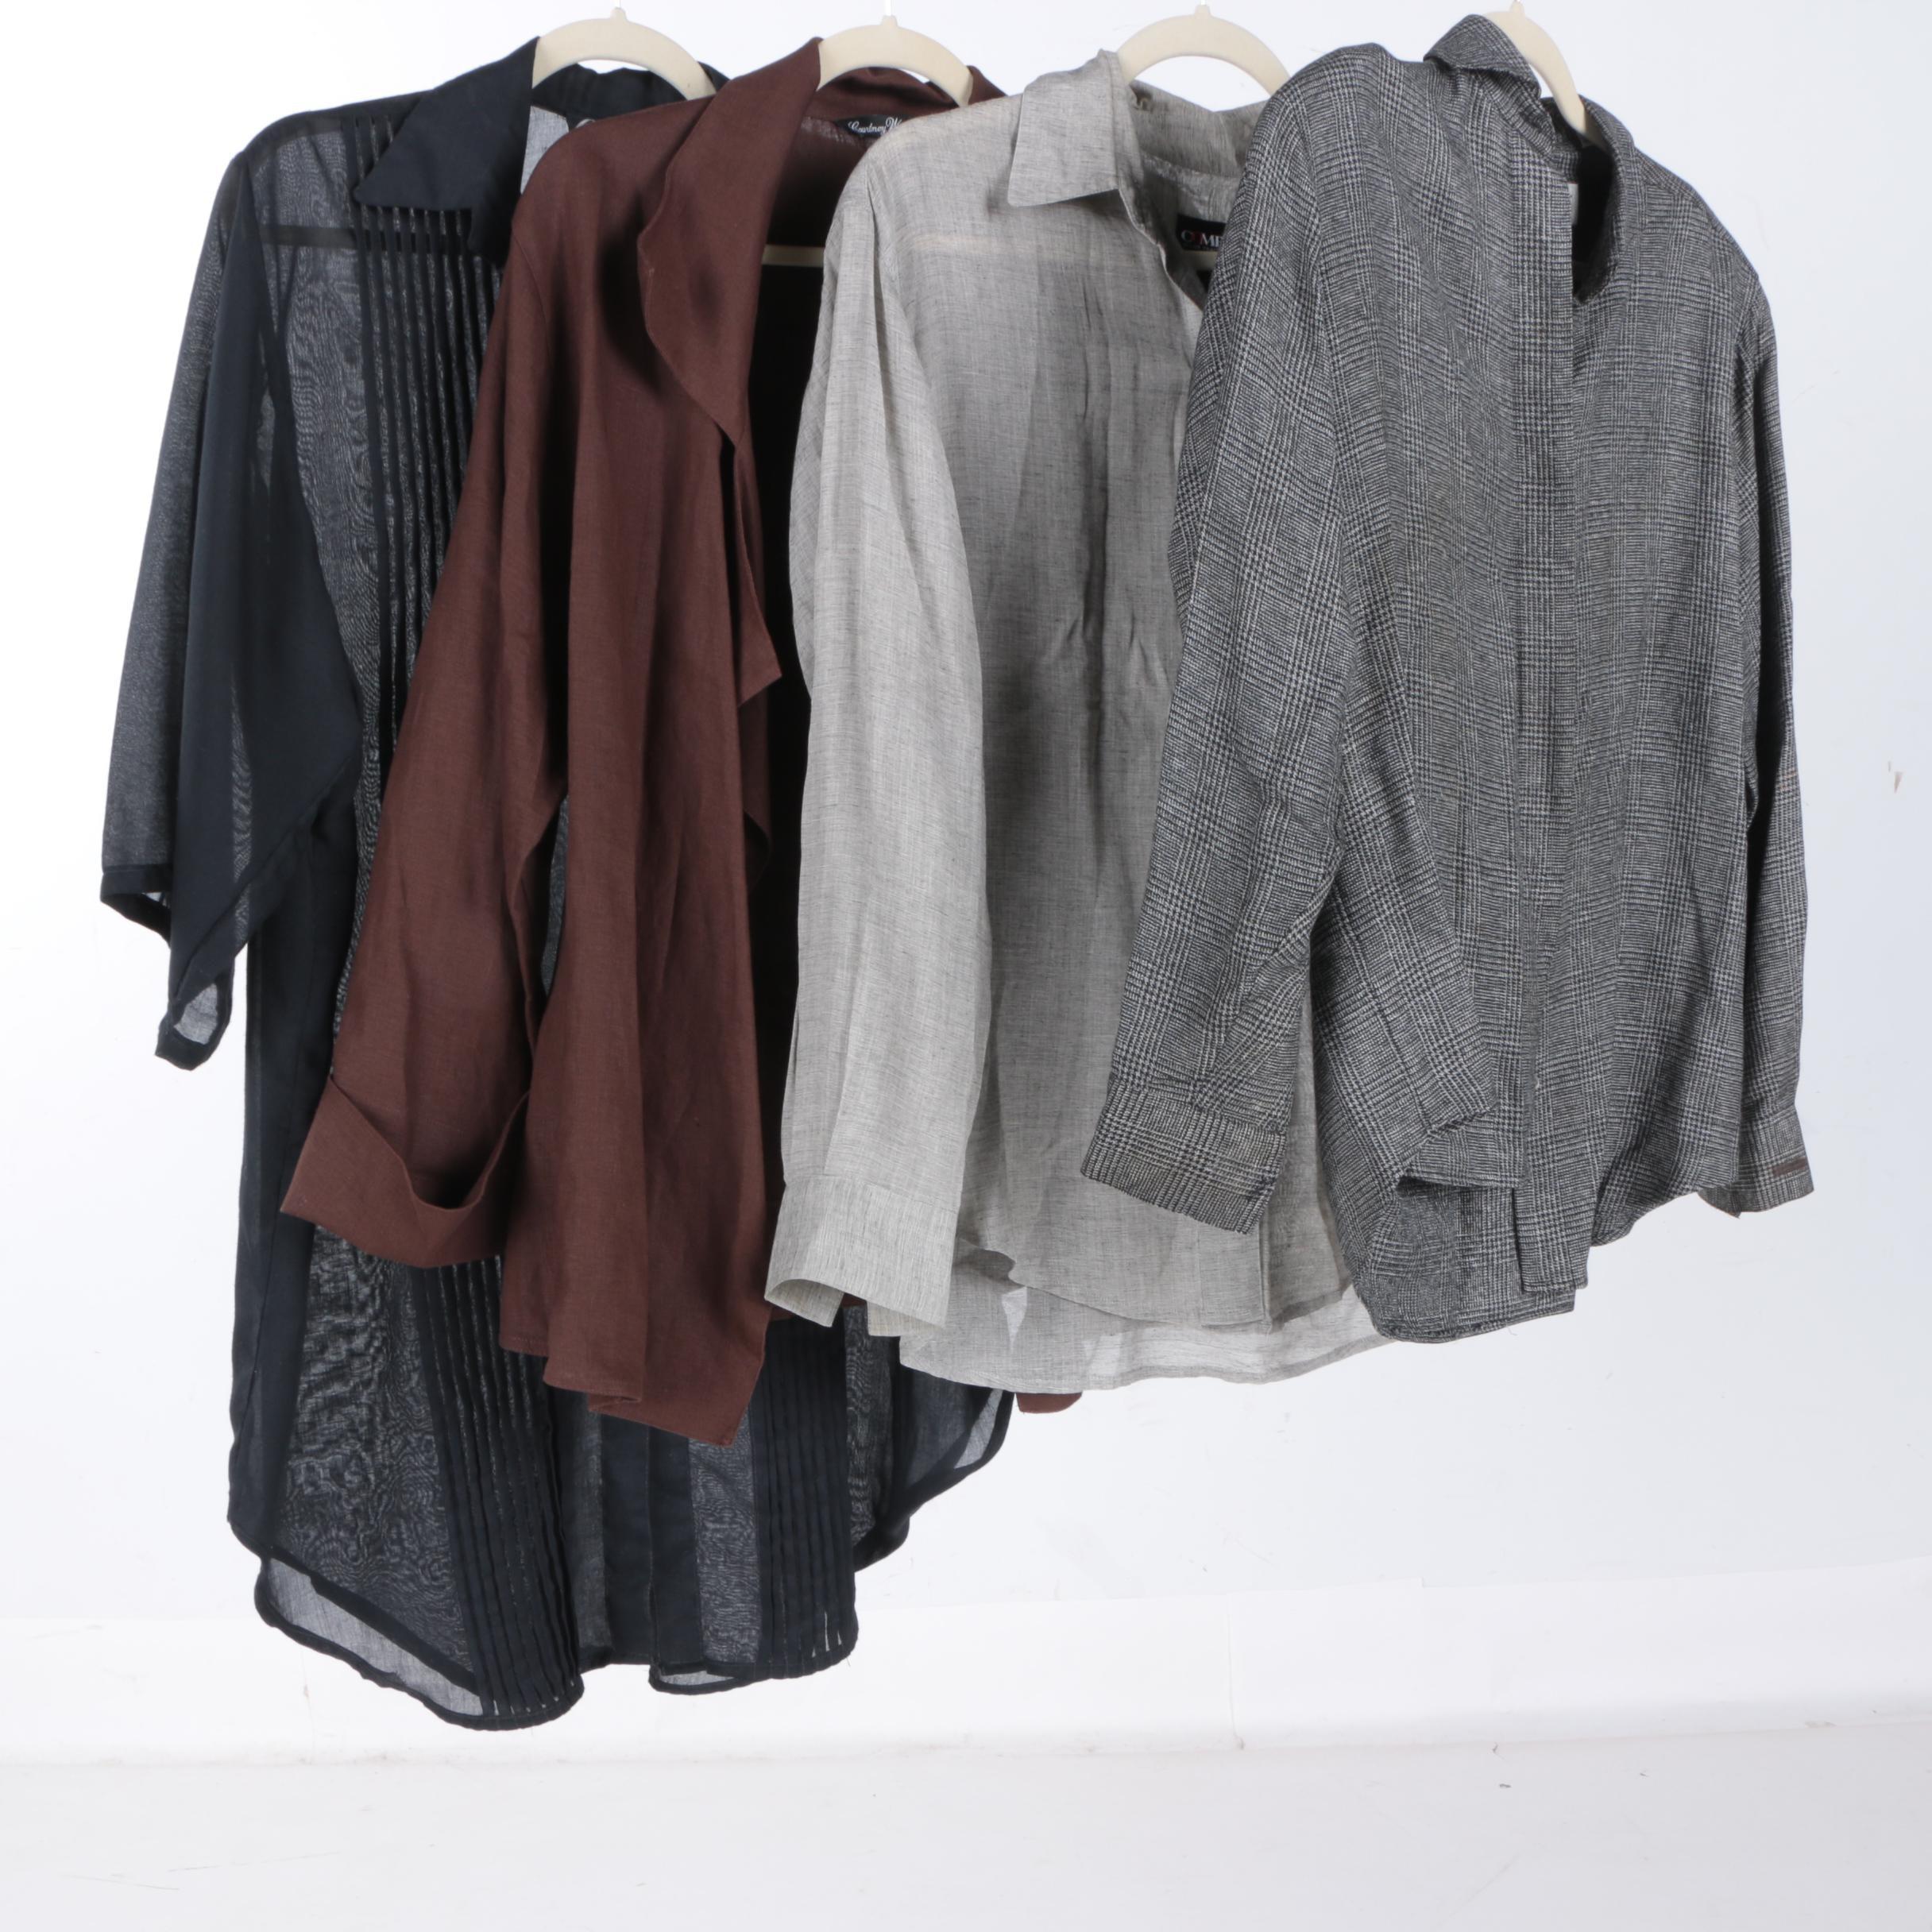 Assortment of Women's Blouses